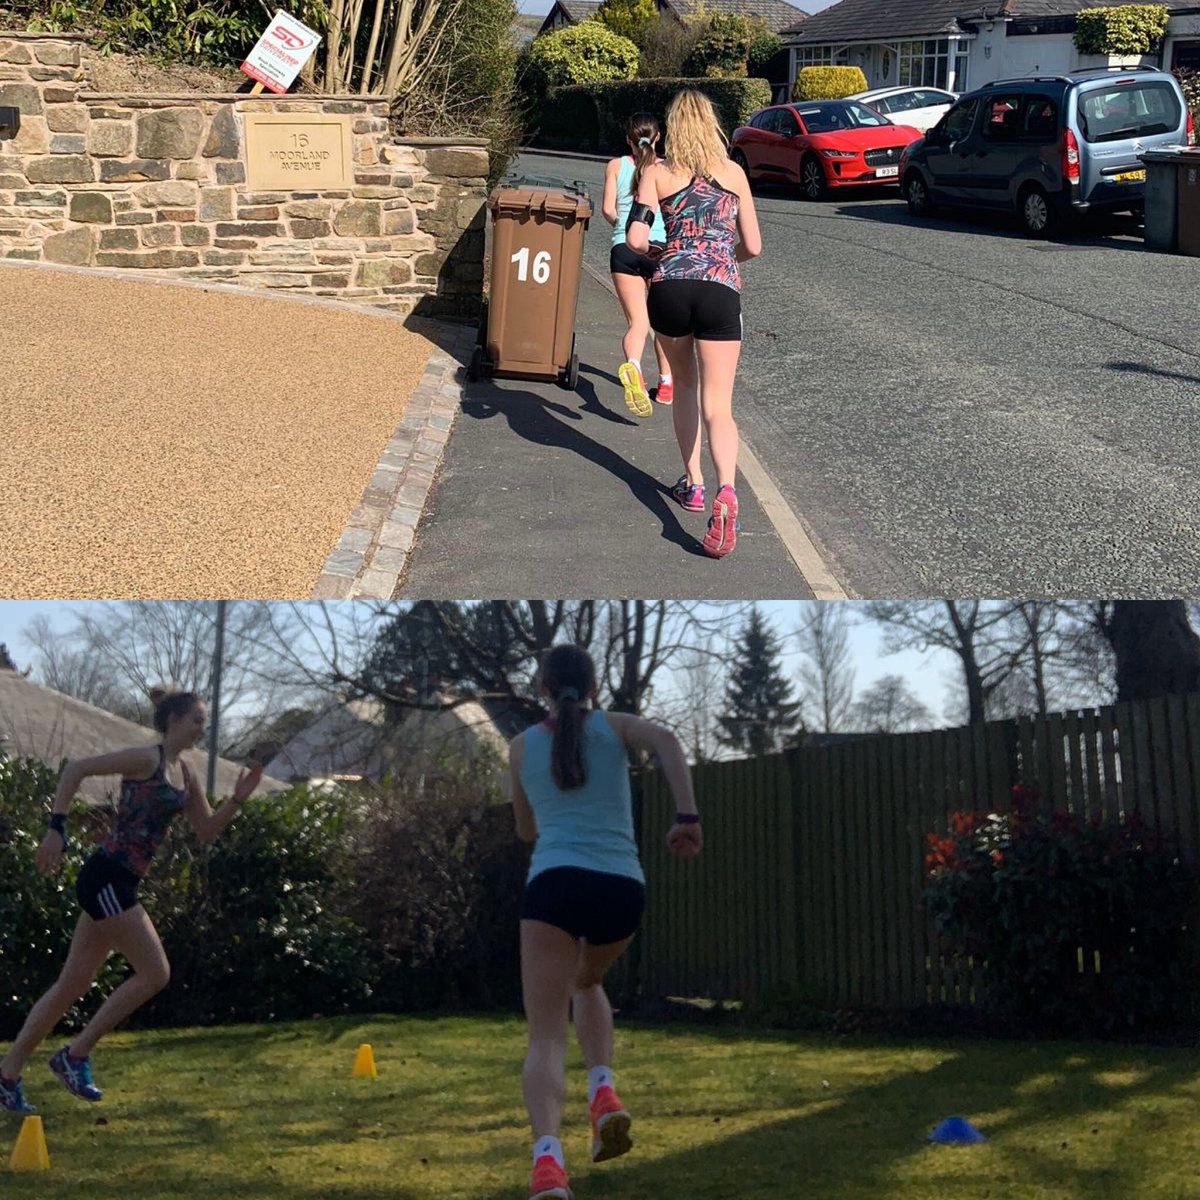 U12 Aimee & U16 Jess with some speed & endurance work #Sisters  pic.twitter.com/xWMUBRati4